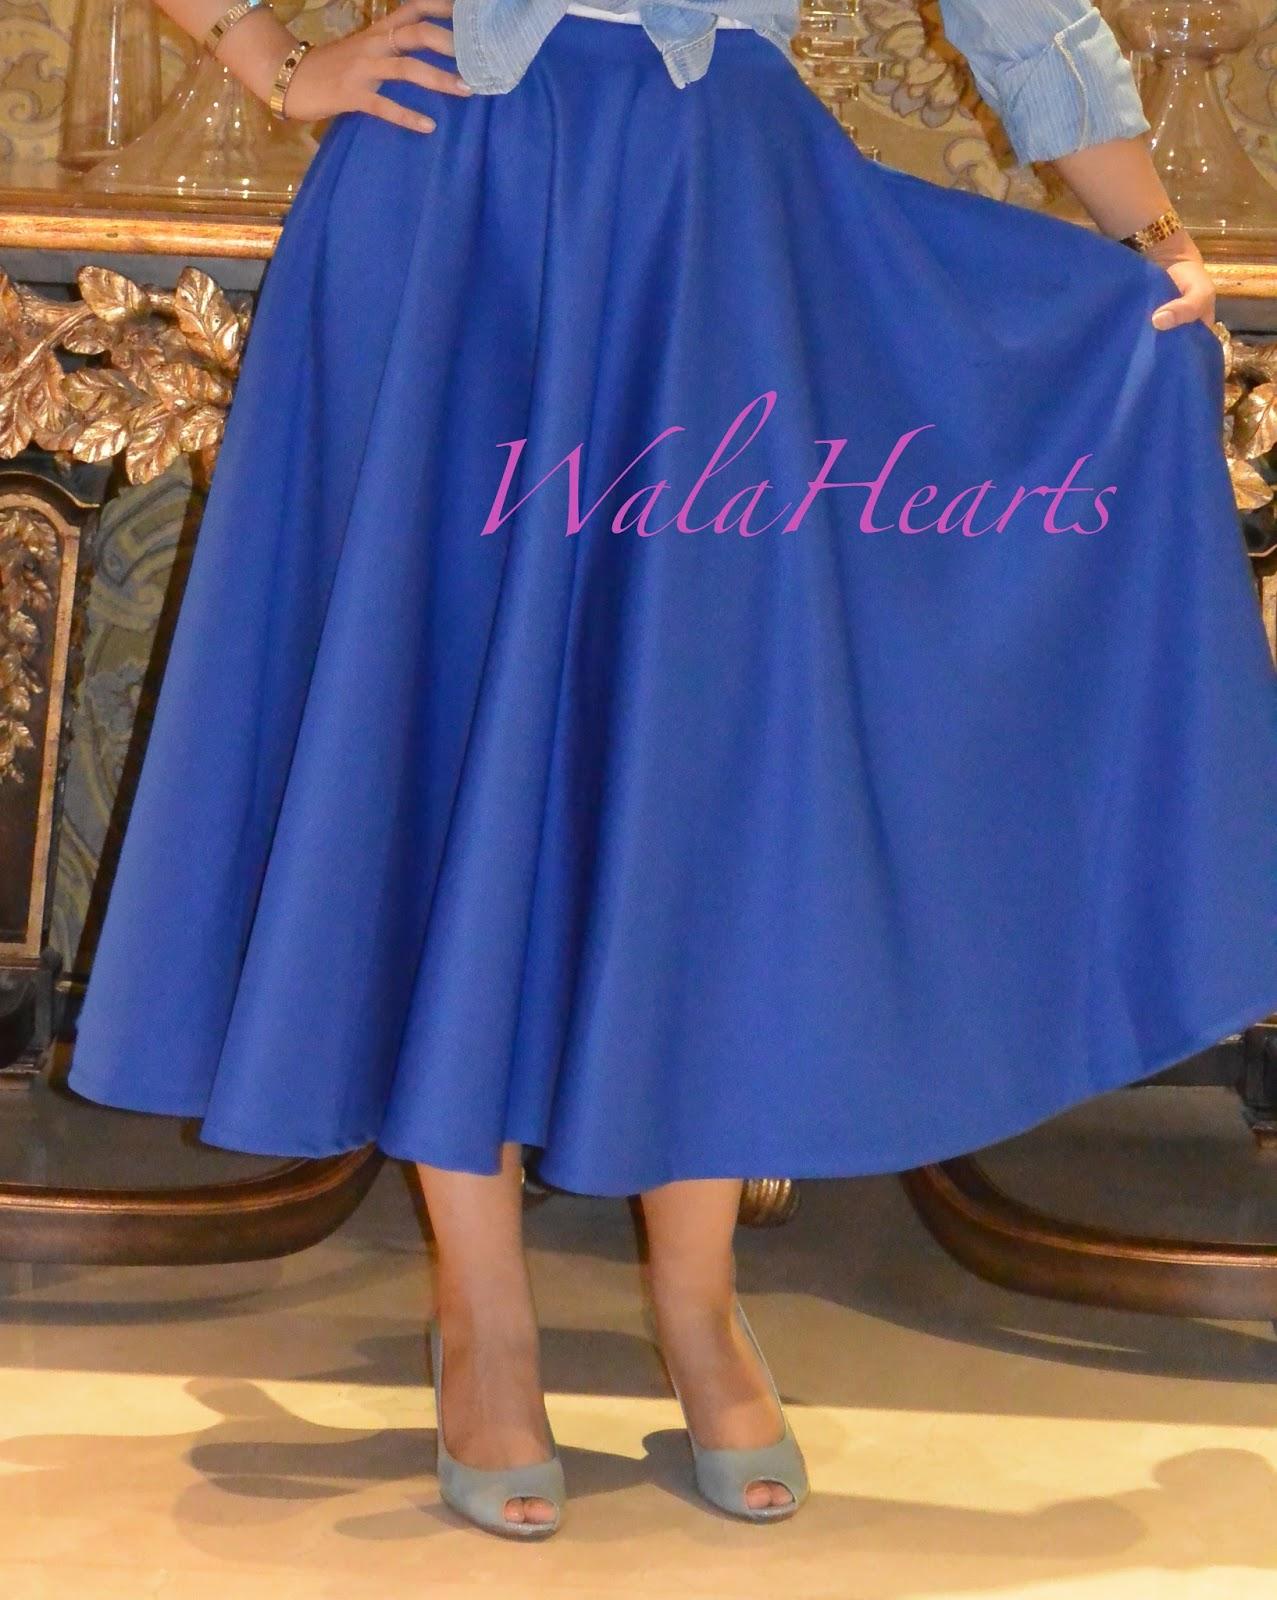 8f23c10fe 1 Skirt 3 Different Looks | WalaHearts | Bloglovin'